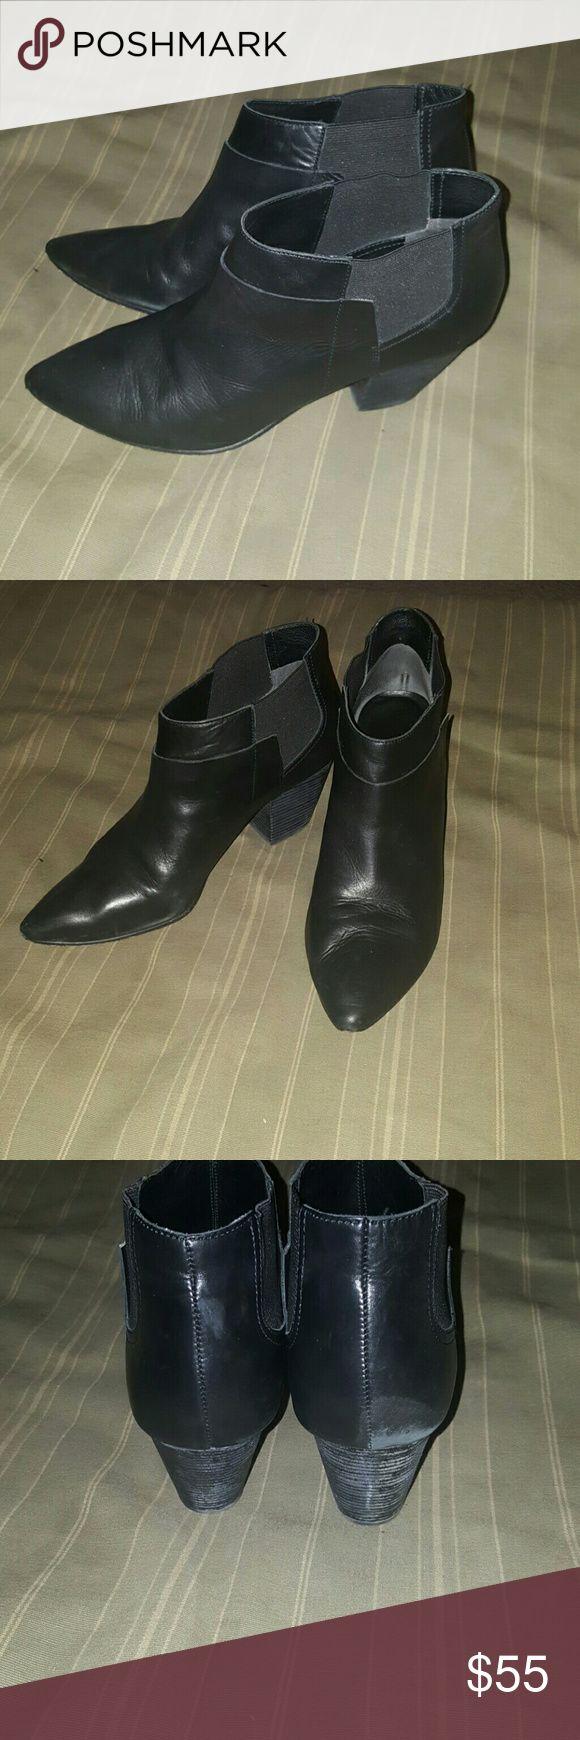 belle sigerson morrison booties belle sigerson morrison booties.  Gently worn, pictured Belle by Sigerson Morrison Shoes Ankle Boots & Booties